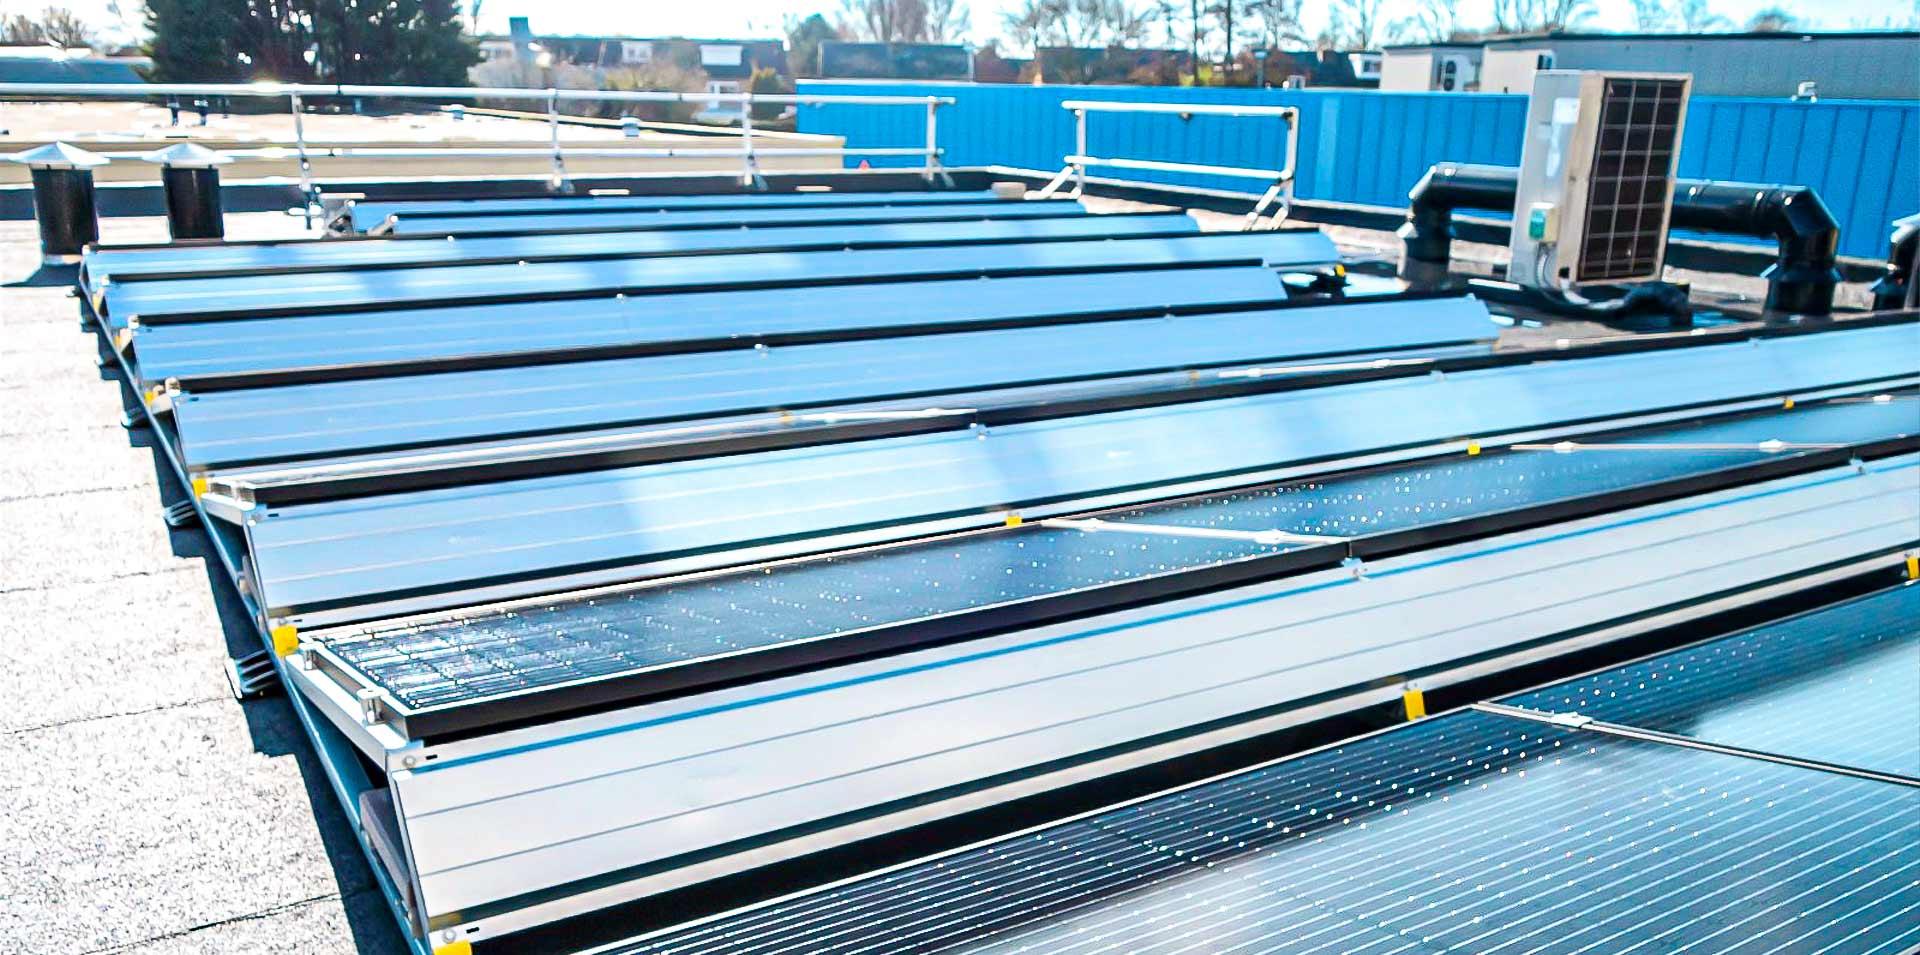 Zonnepanelen installateur VvE en zakelijk - zonnepanelen op dak bedrijfspand - Multi Energy Solutions